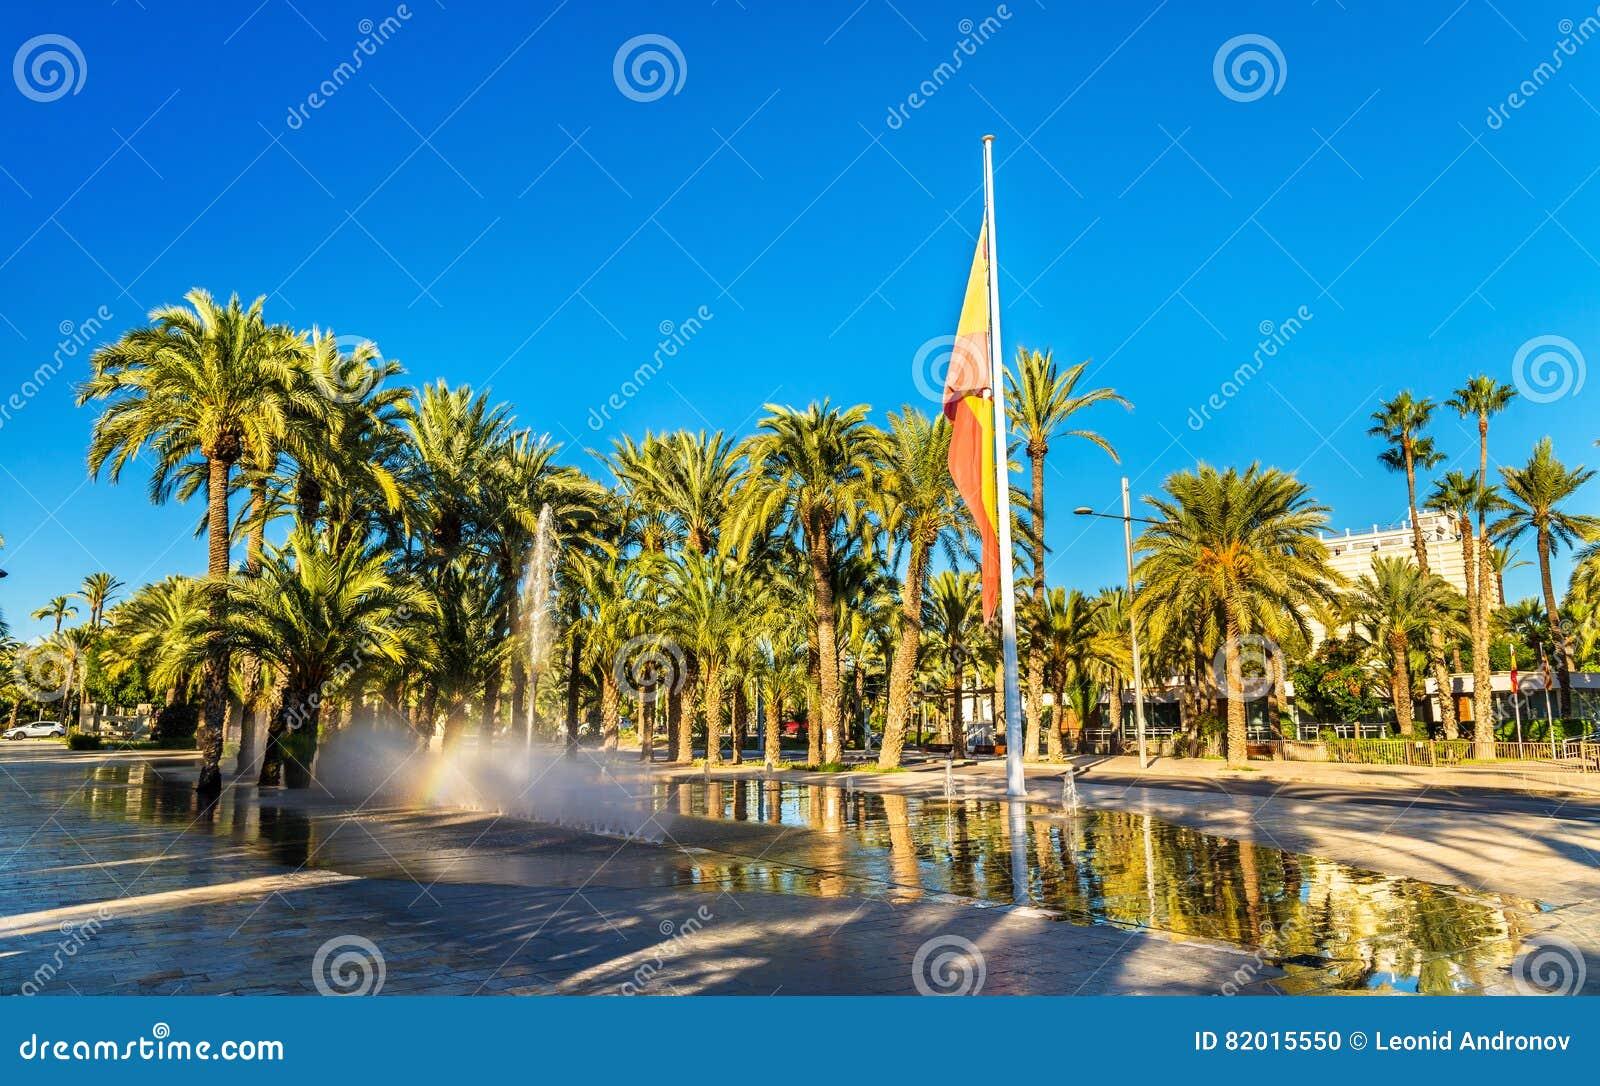 Palmeral de Elche, Spain Local da herança do Unesco